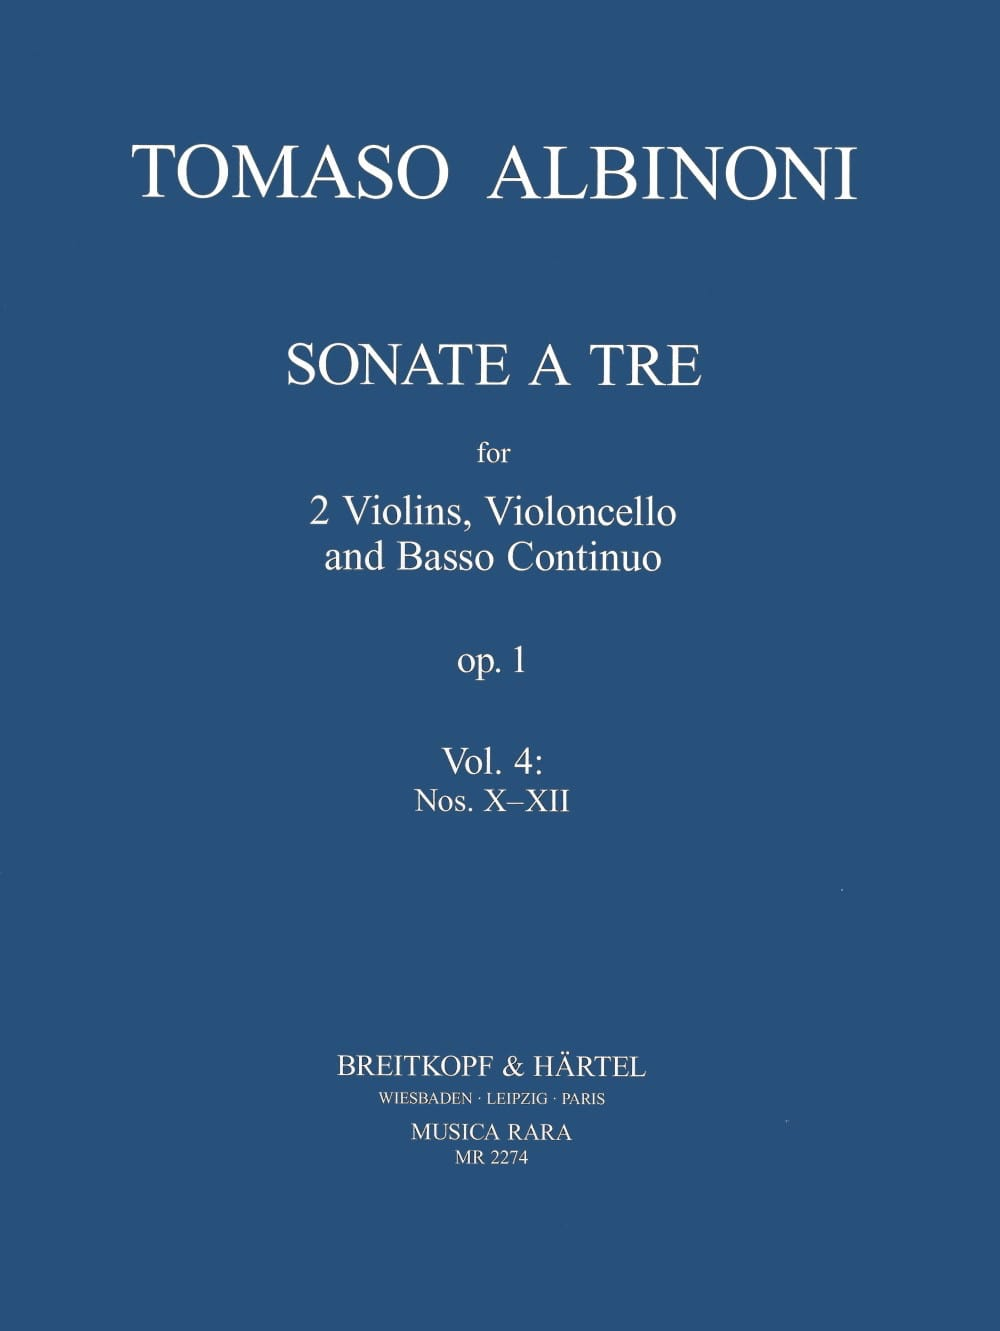 Sonata a tre op. 1 - Volume 4: X-XII - ALBINONI - laflutedepan.com